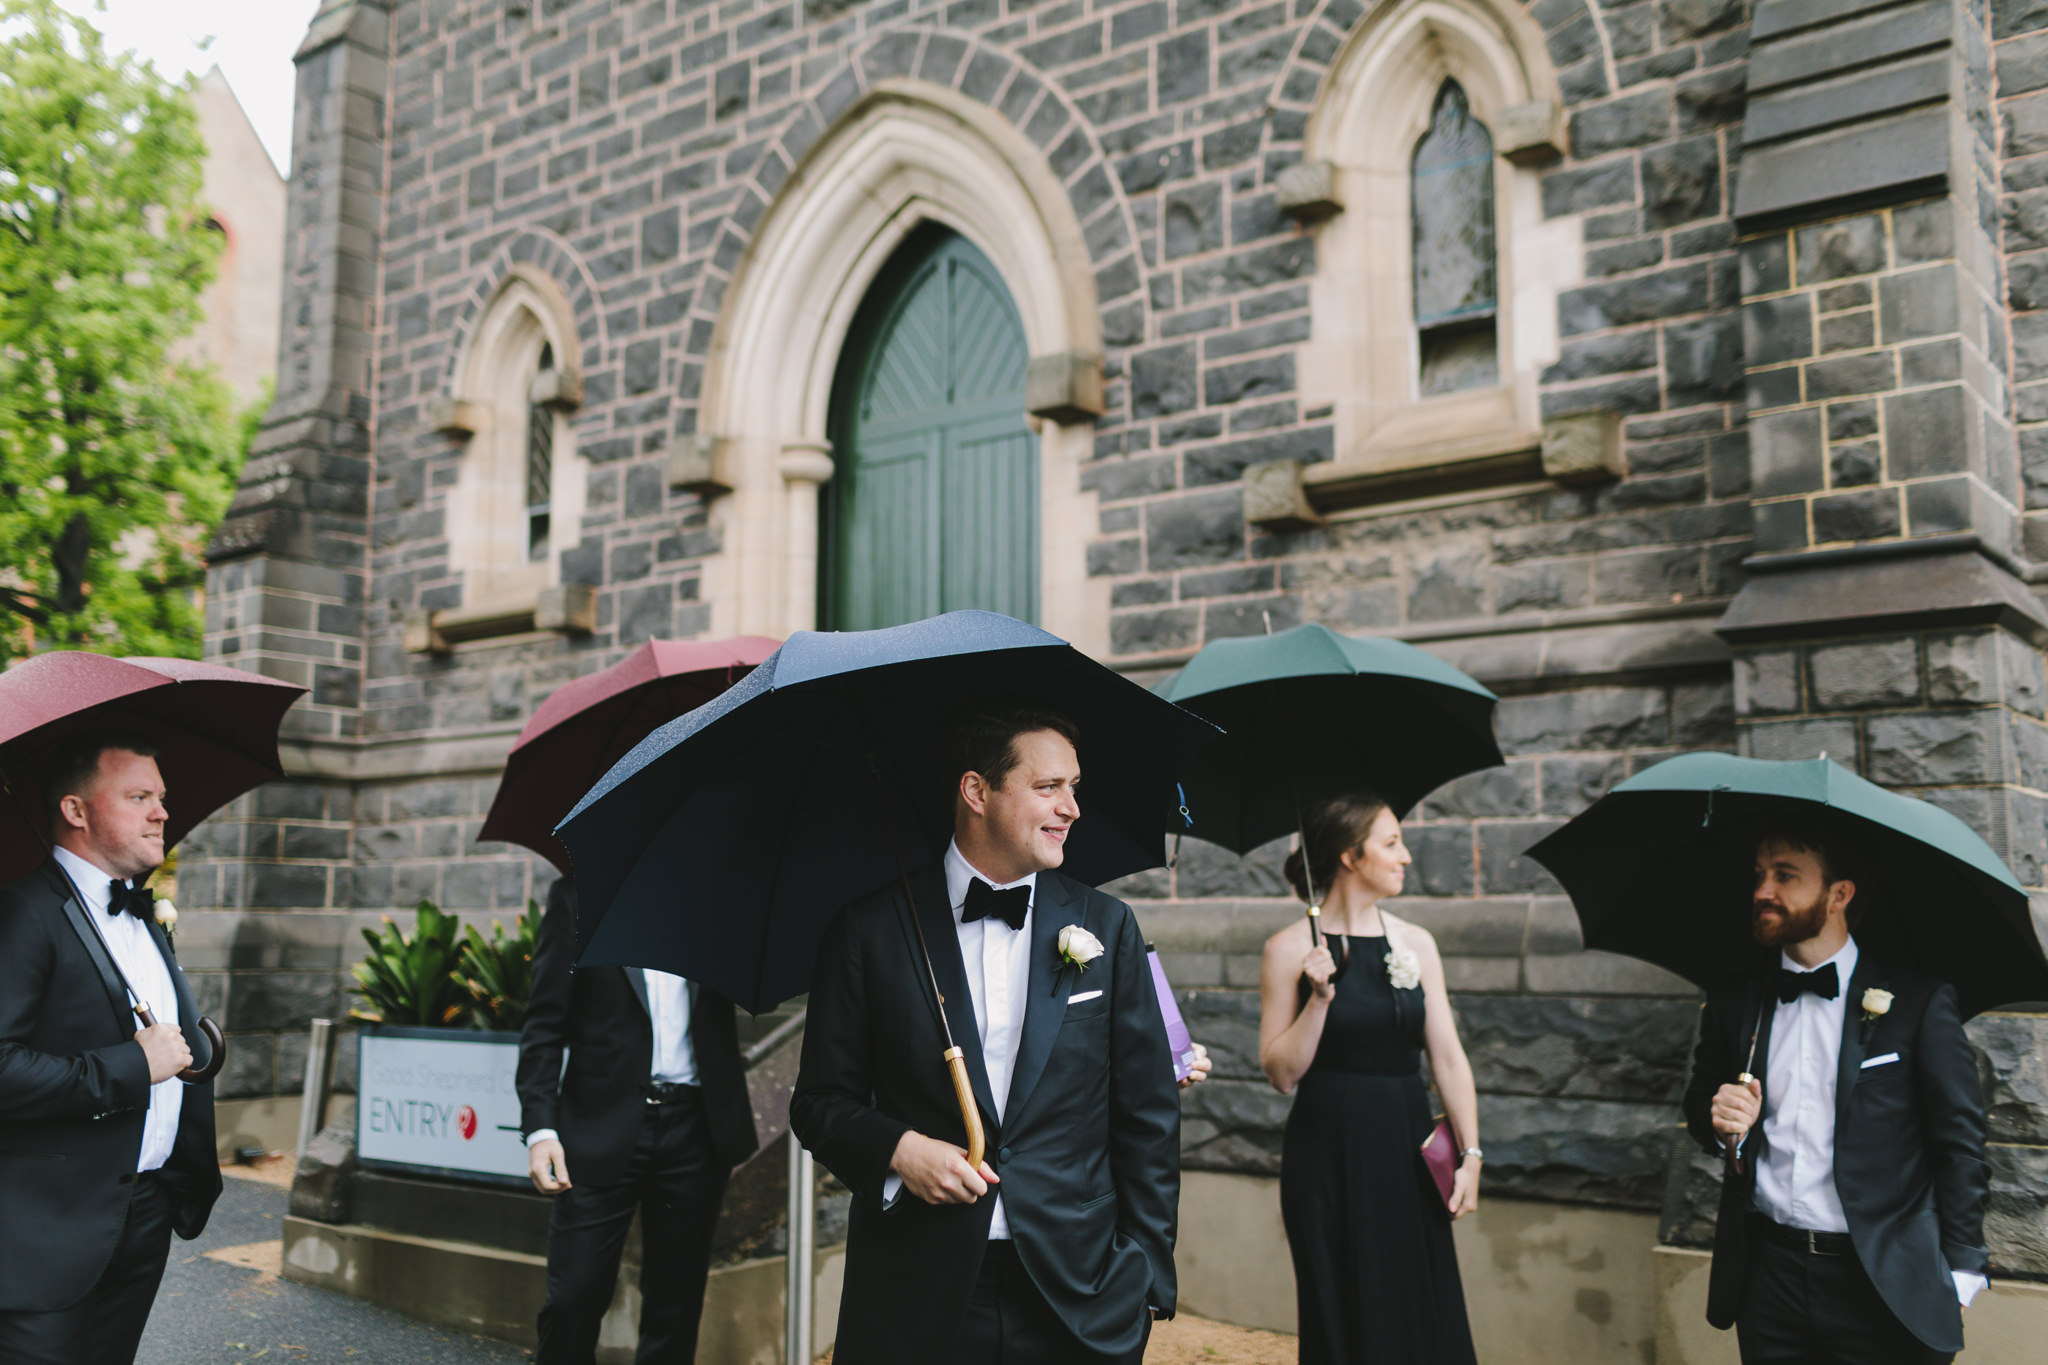 Abbotsford_Convent_Wedding_Peter_Anna037.JPG